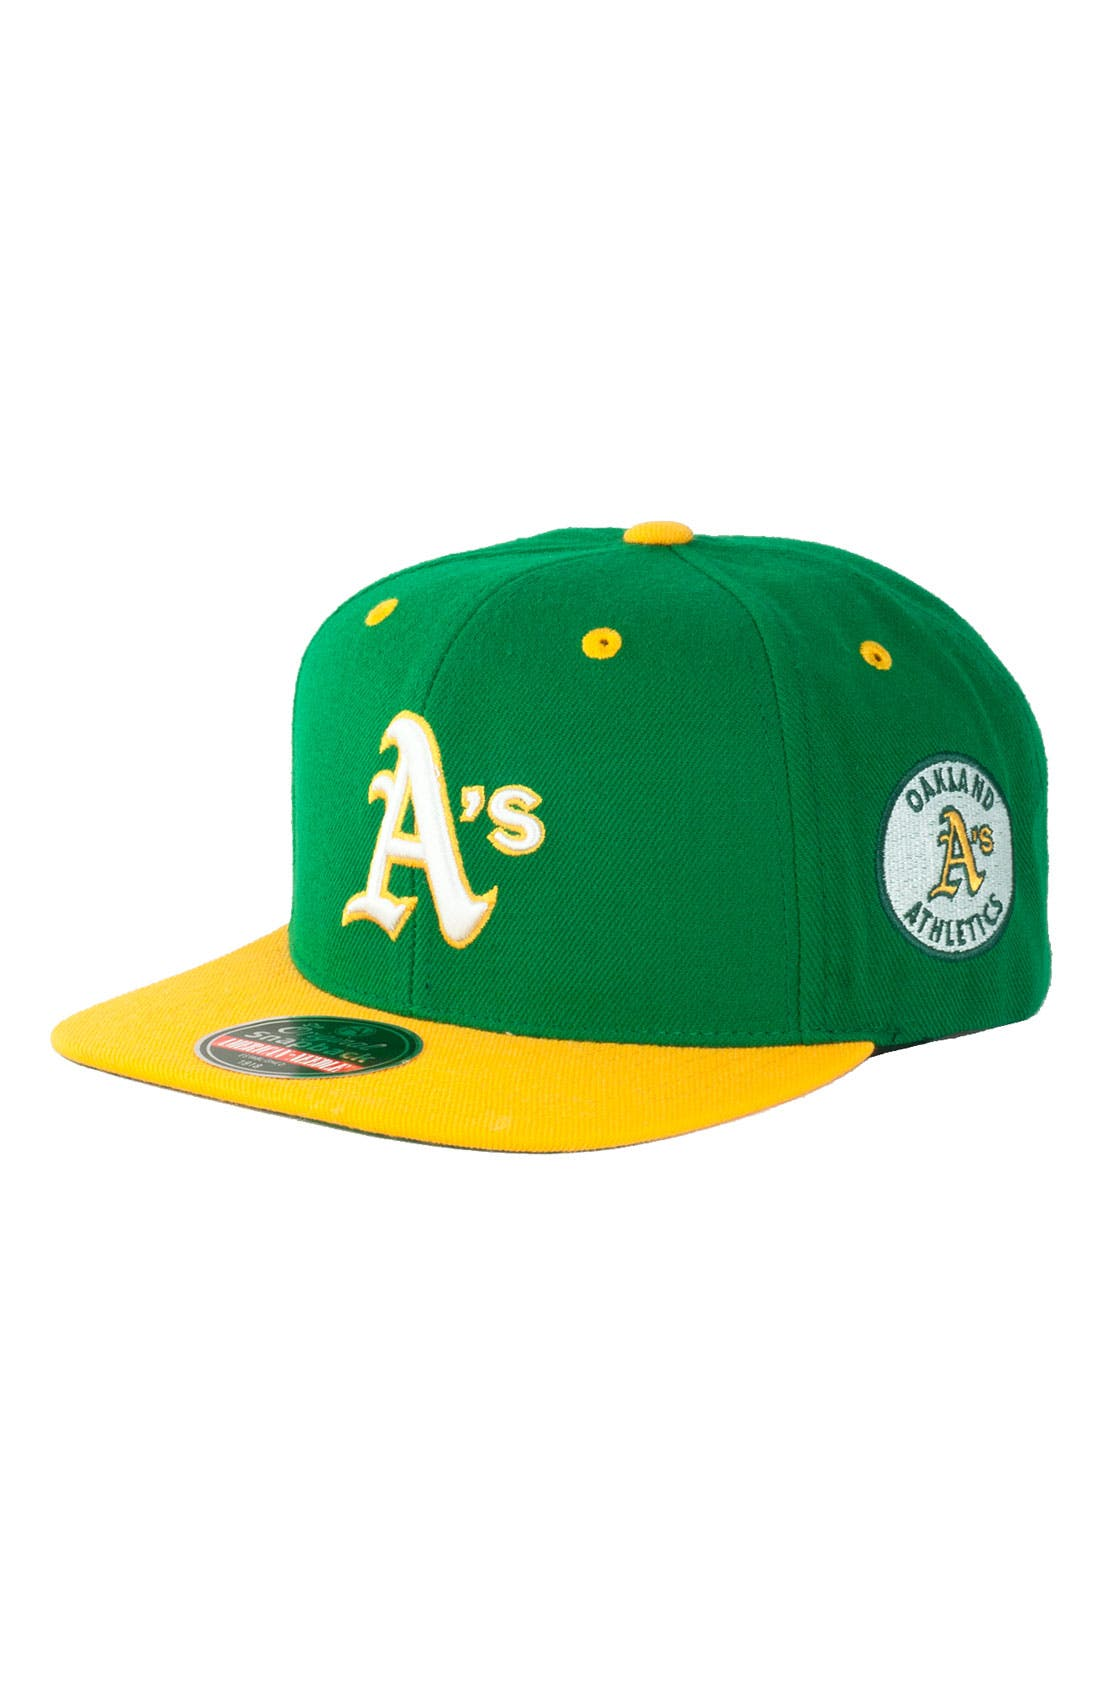 Alternate Image 1 Selected - American Needle 'Blockhead A's' Snapback Baseball Cap